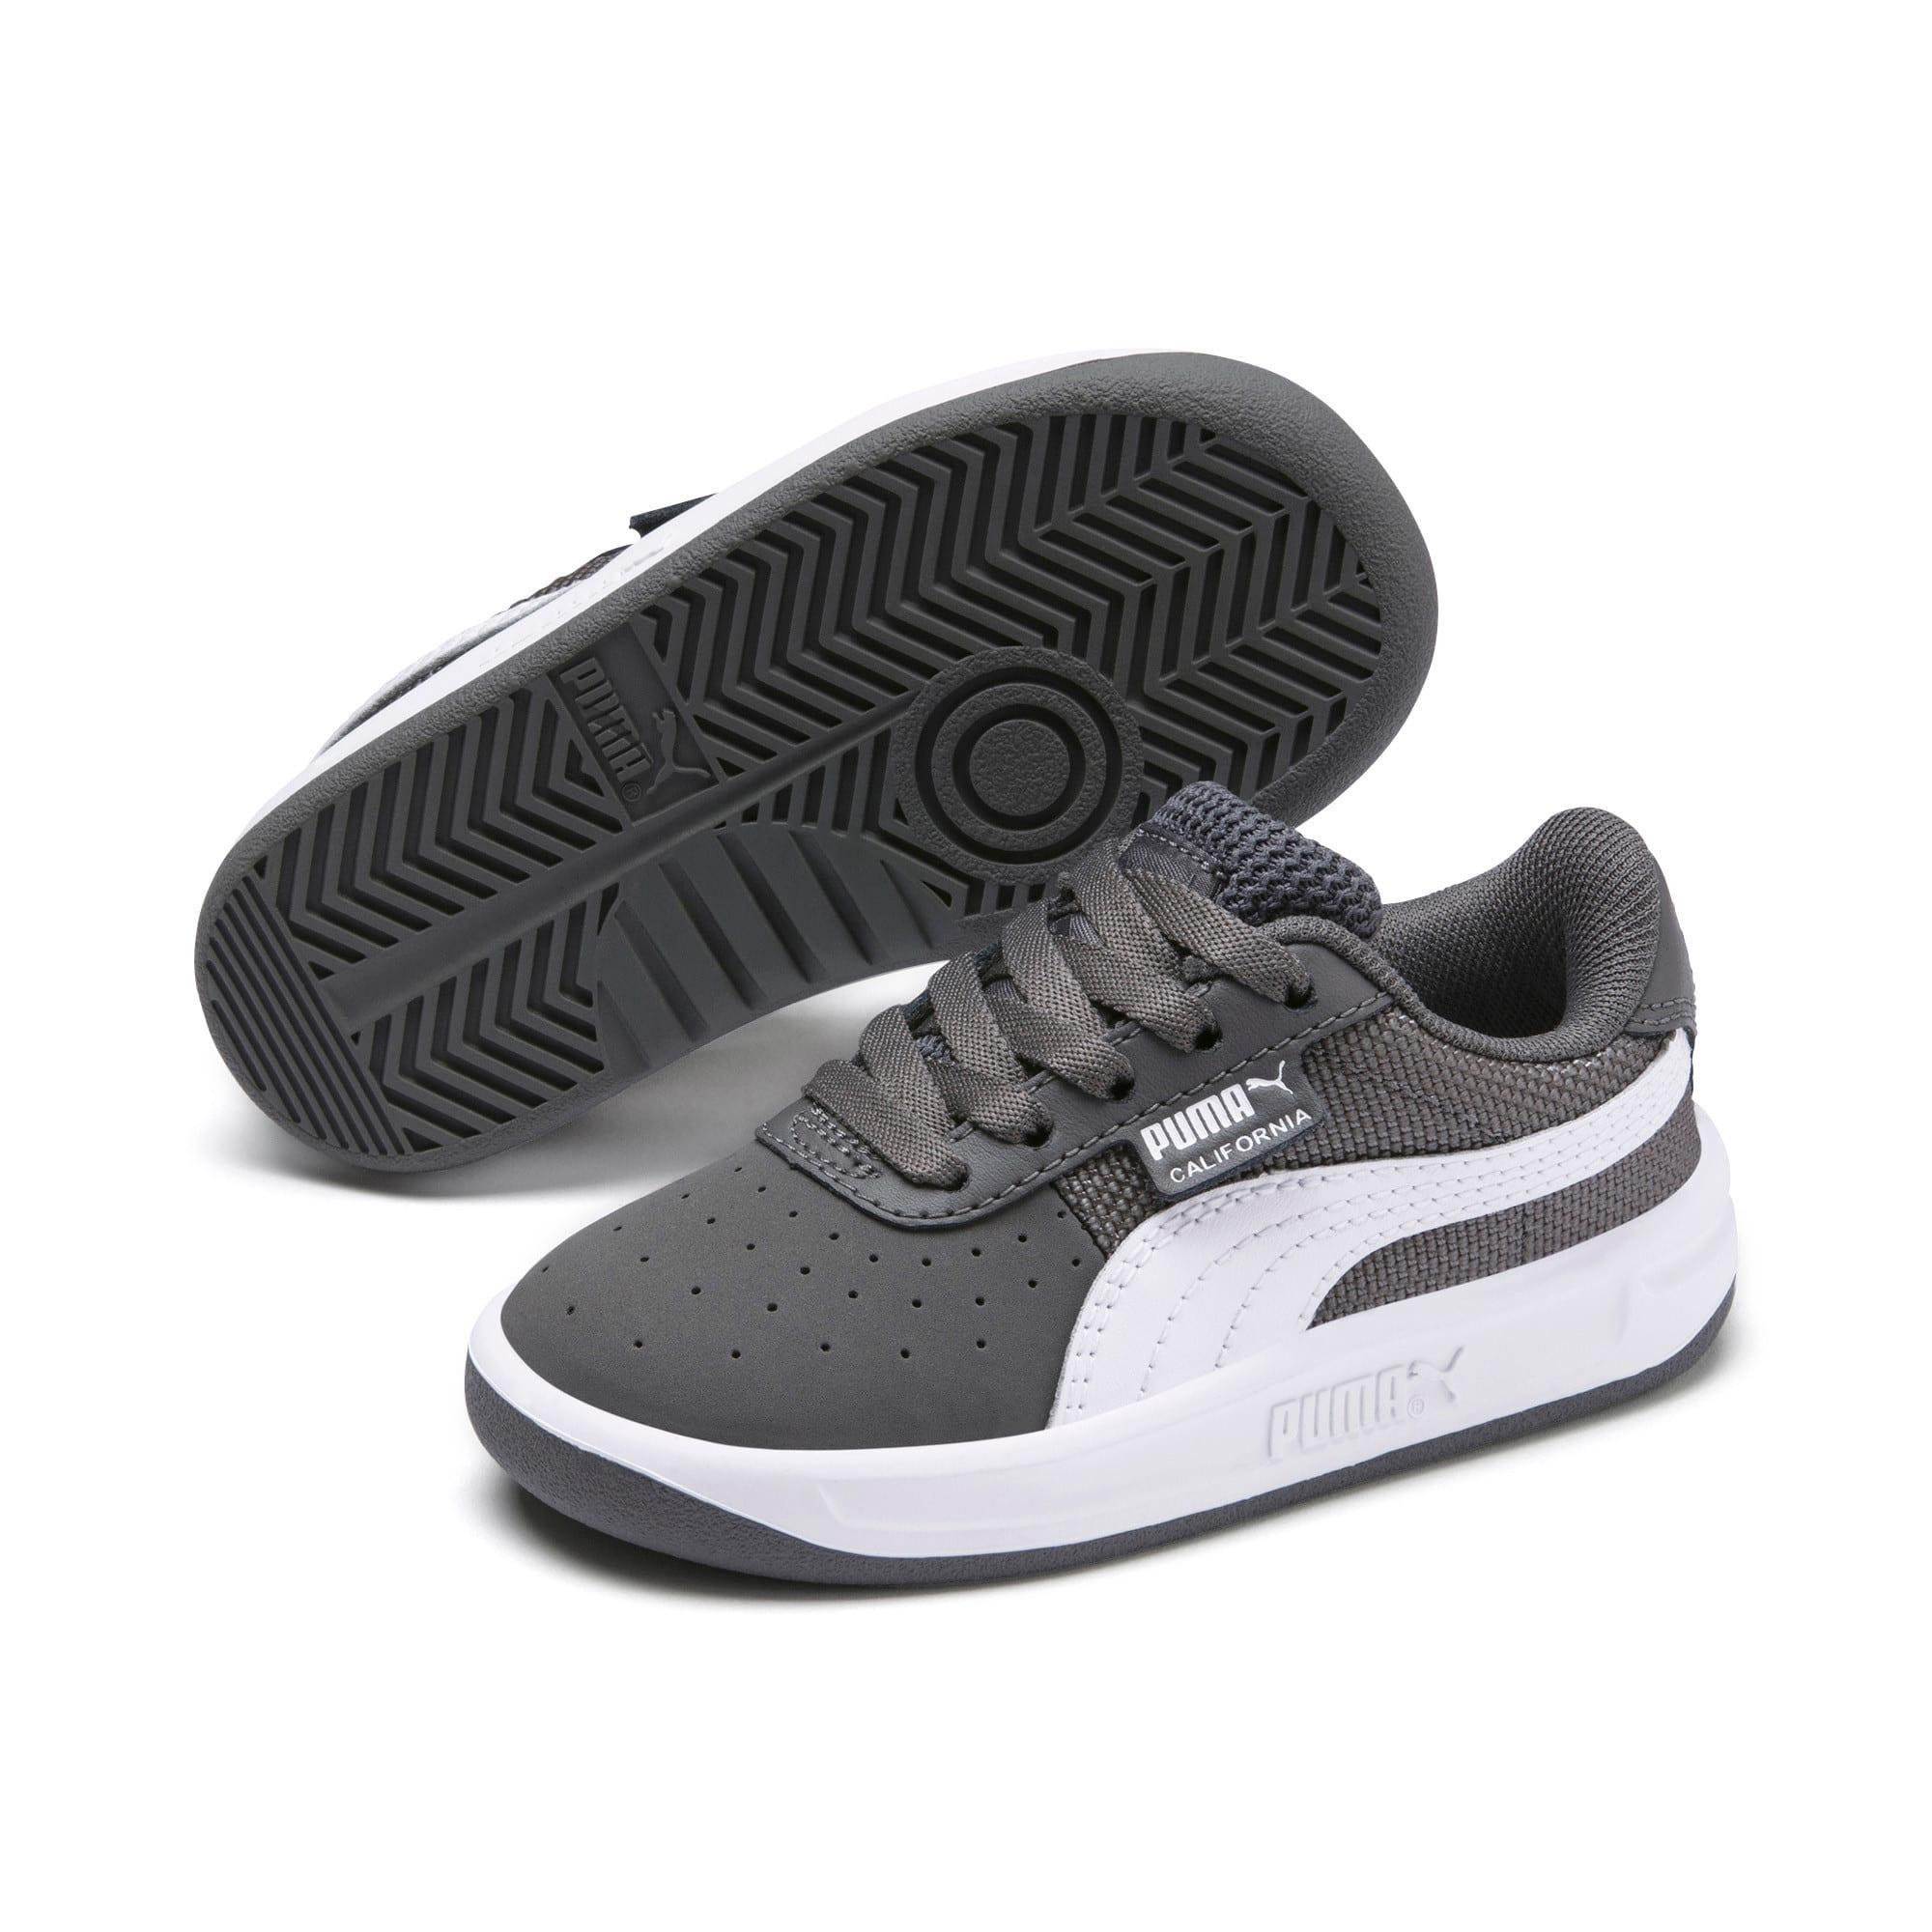 Thumbnail 2 of California Toddler Shoes, CASTLEROCK-Puma White, medium